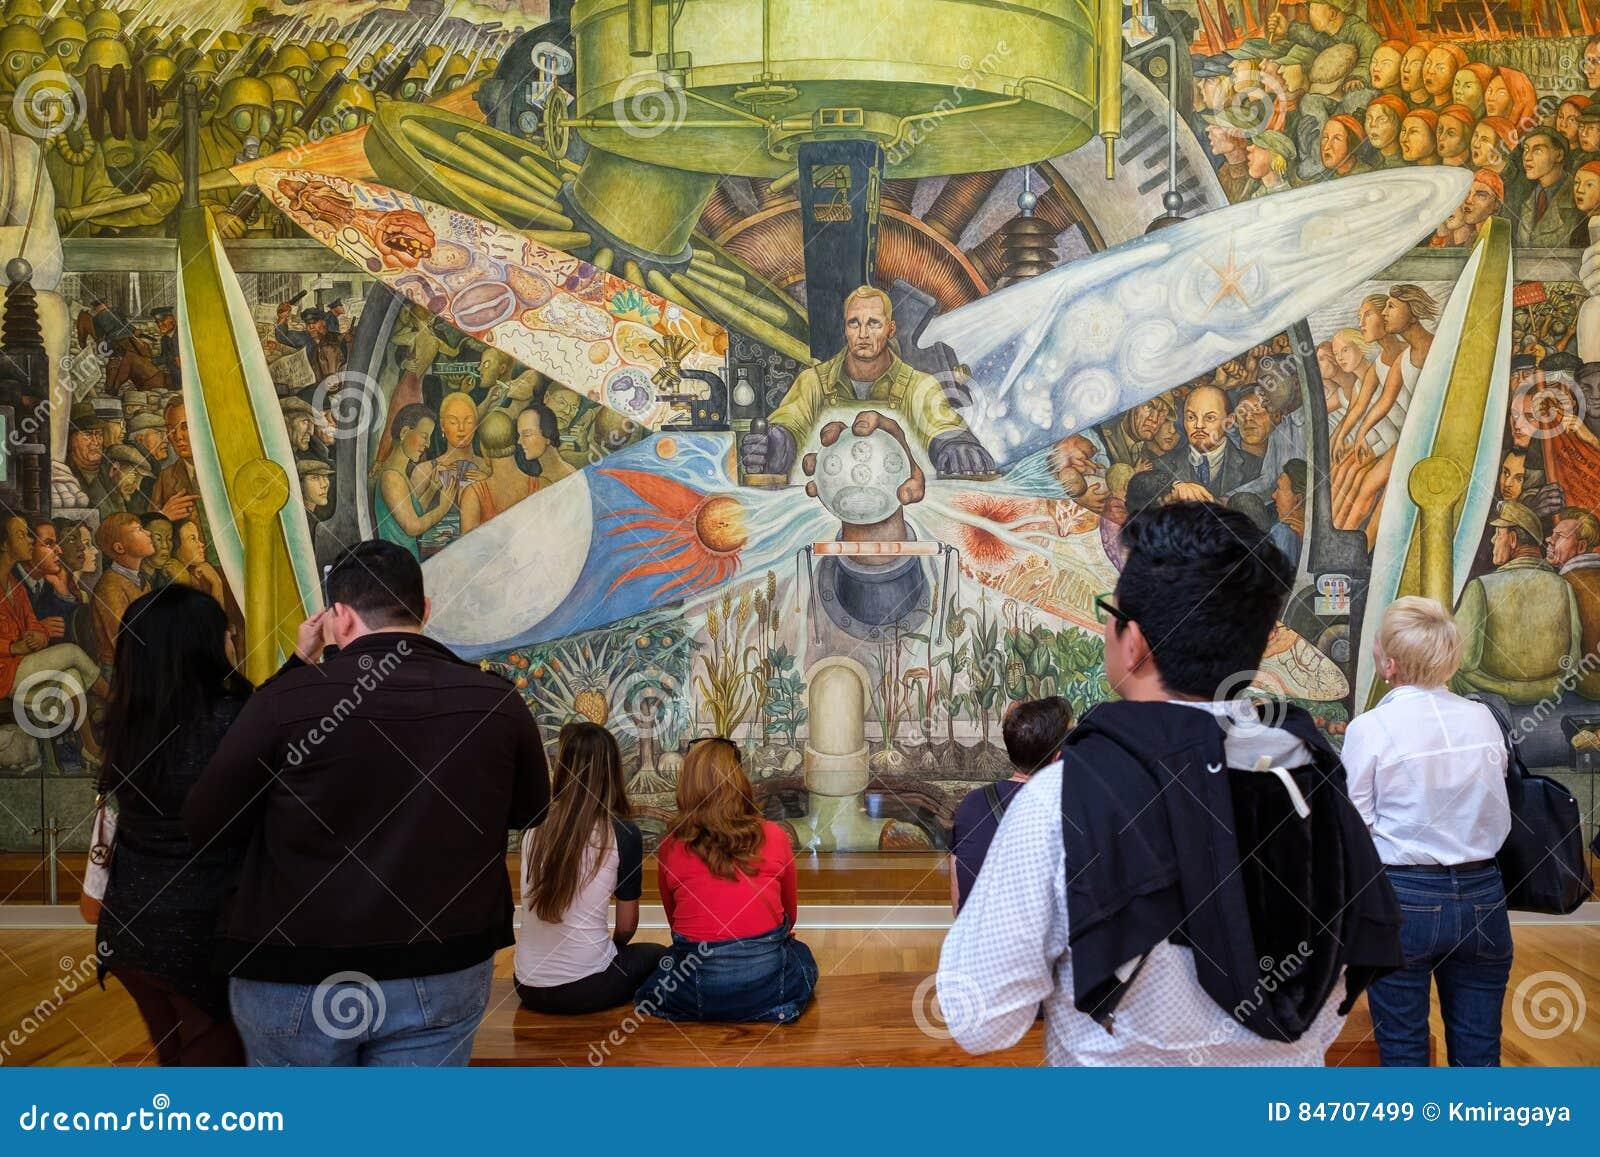 Visitors Admiring The Murals By Diego Rivera At The Palacio De